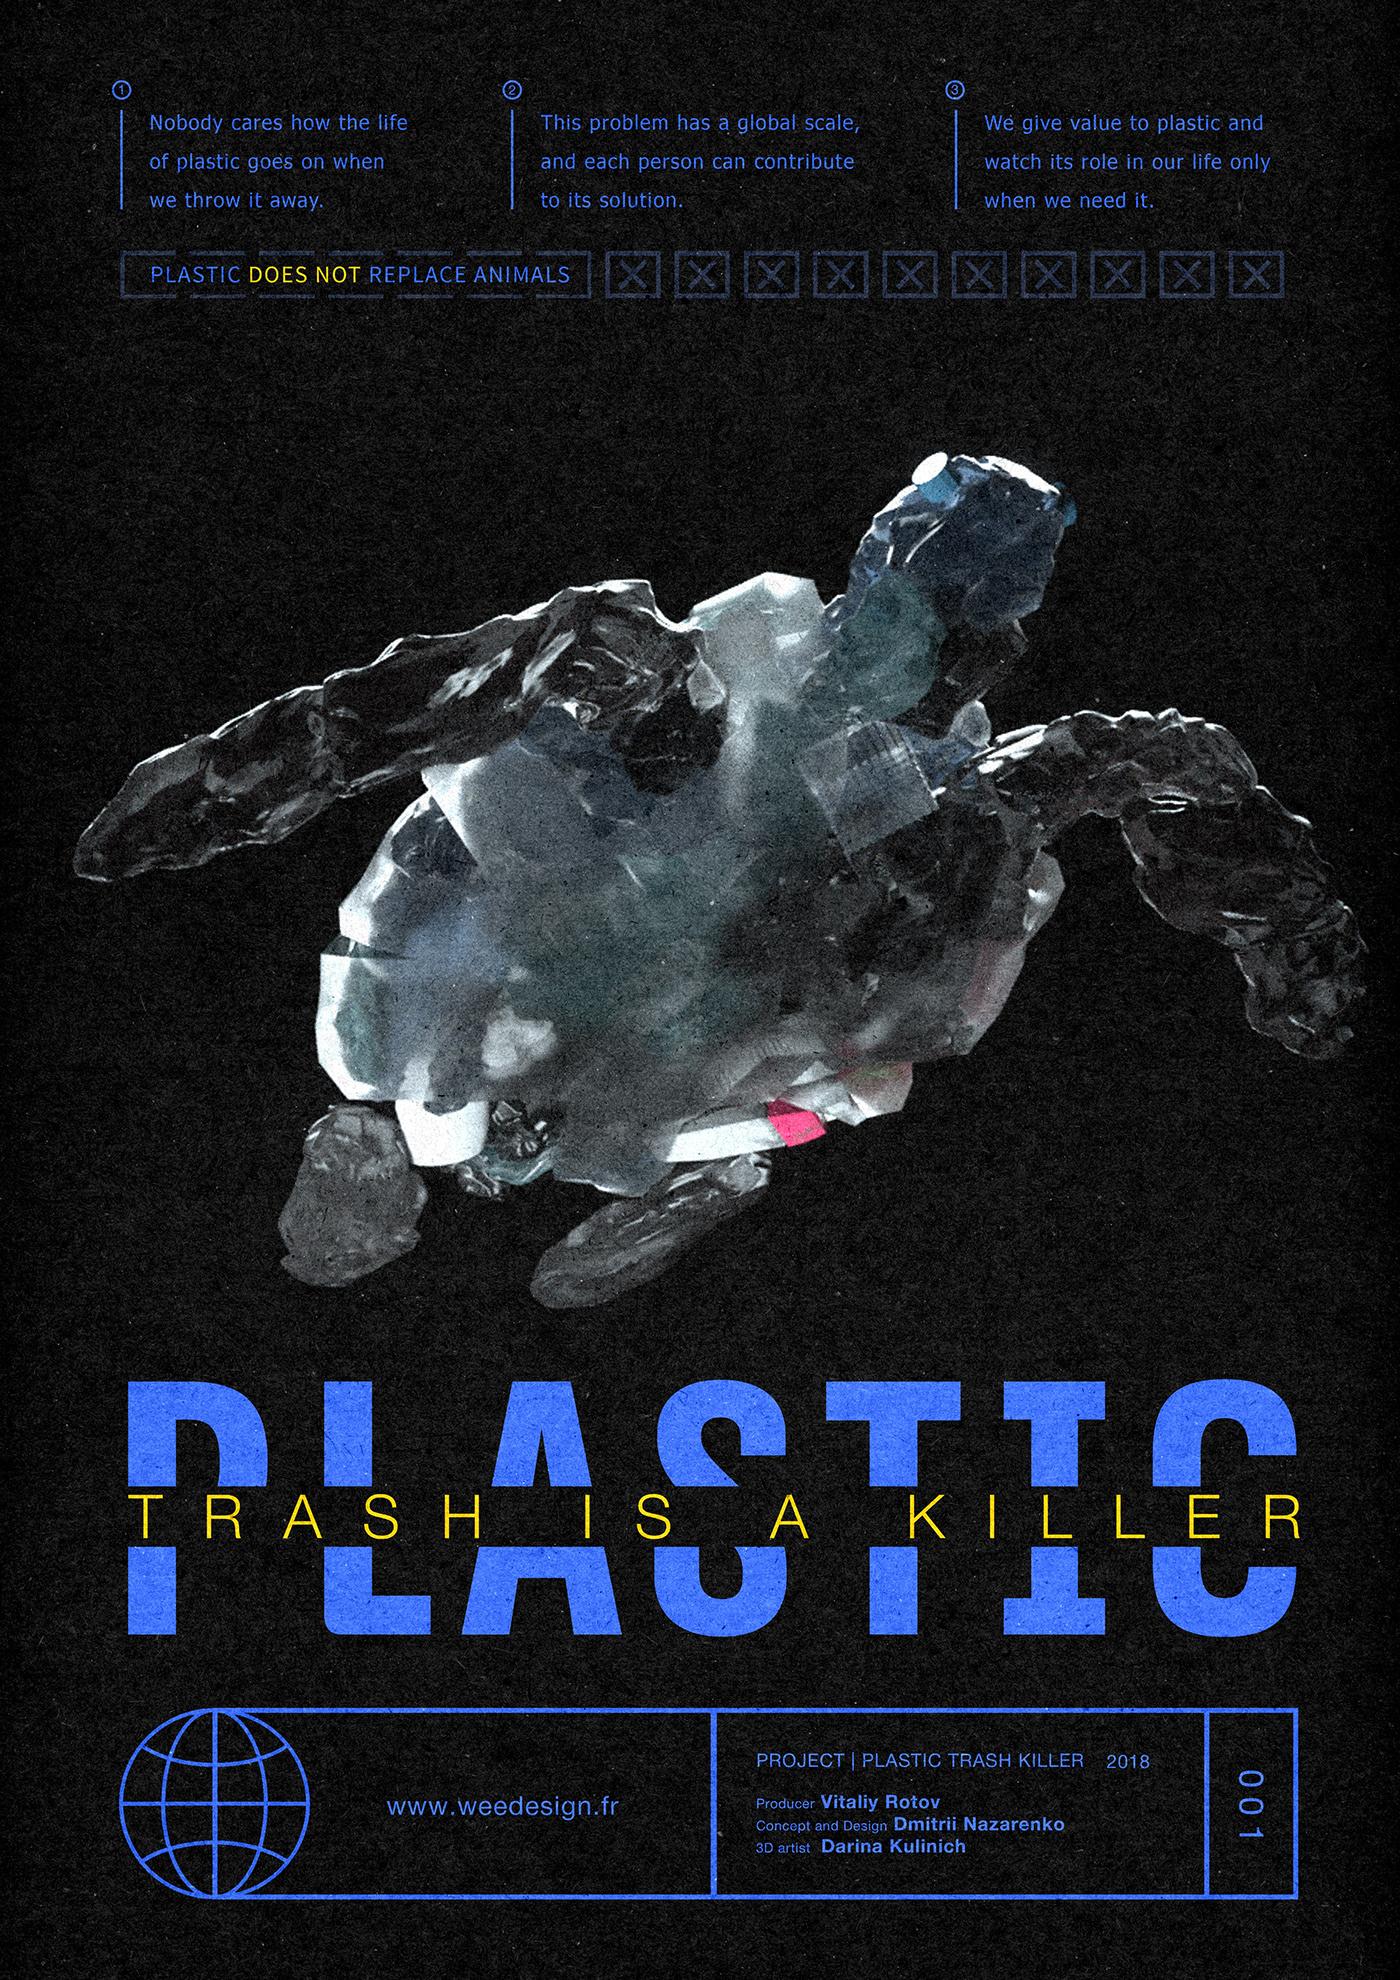 plastic animals trash Ecology Turtle bird penguin poster